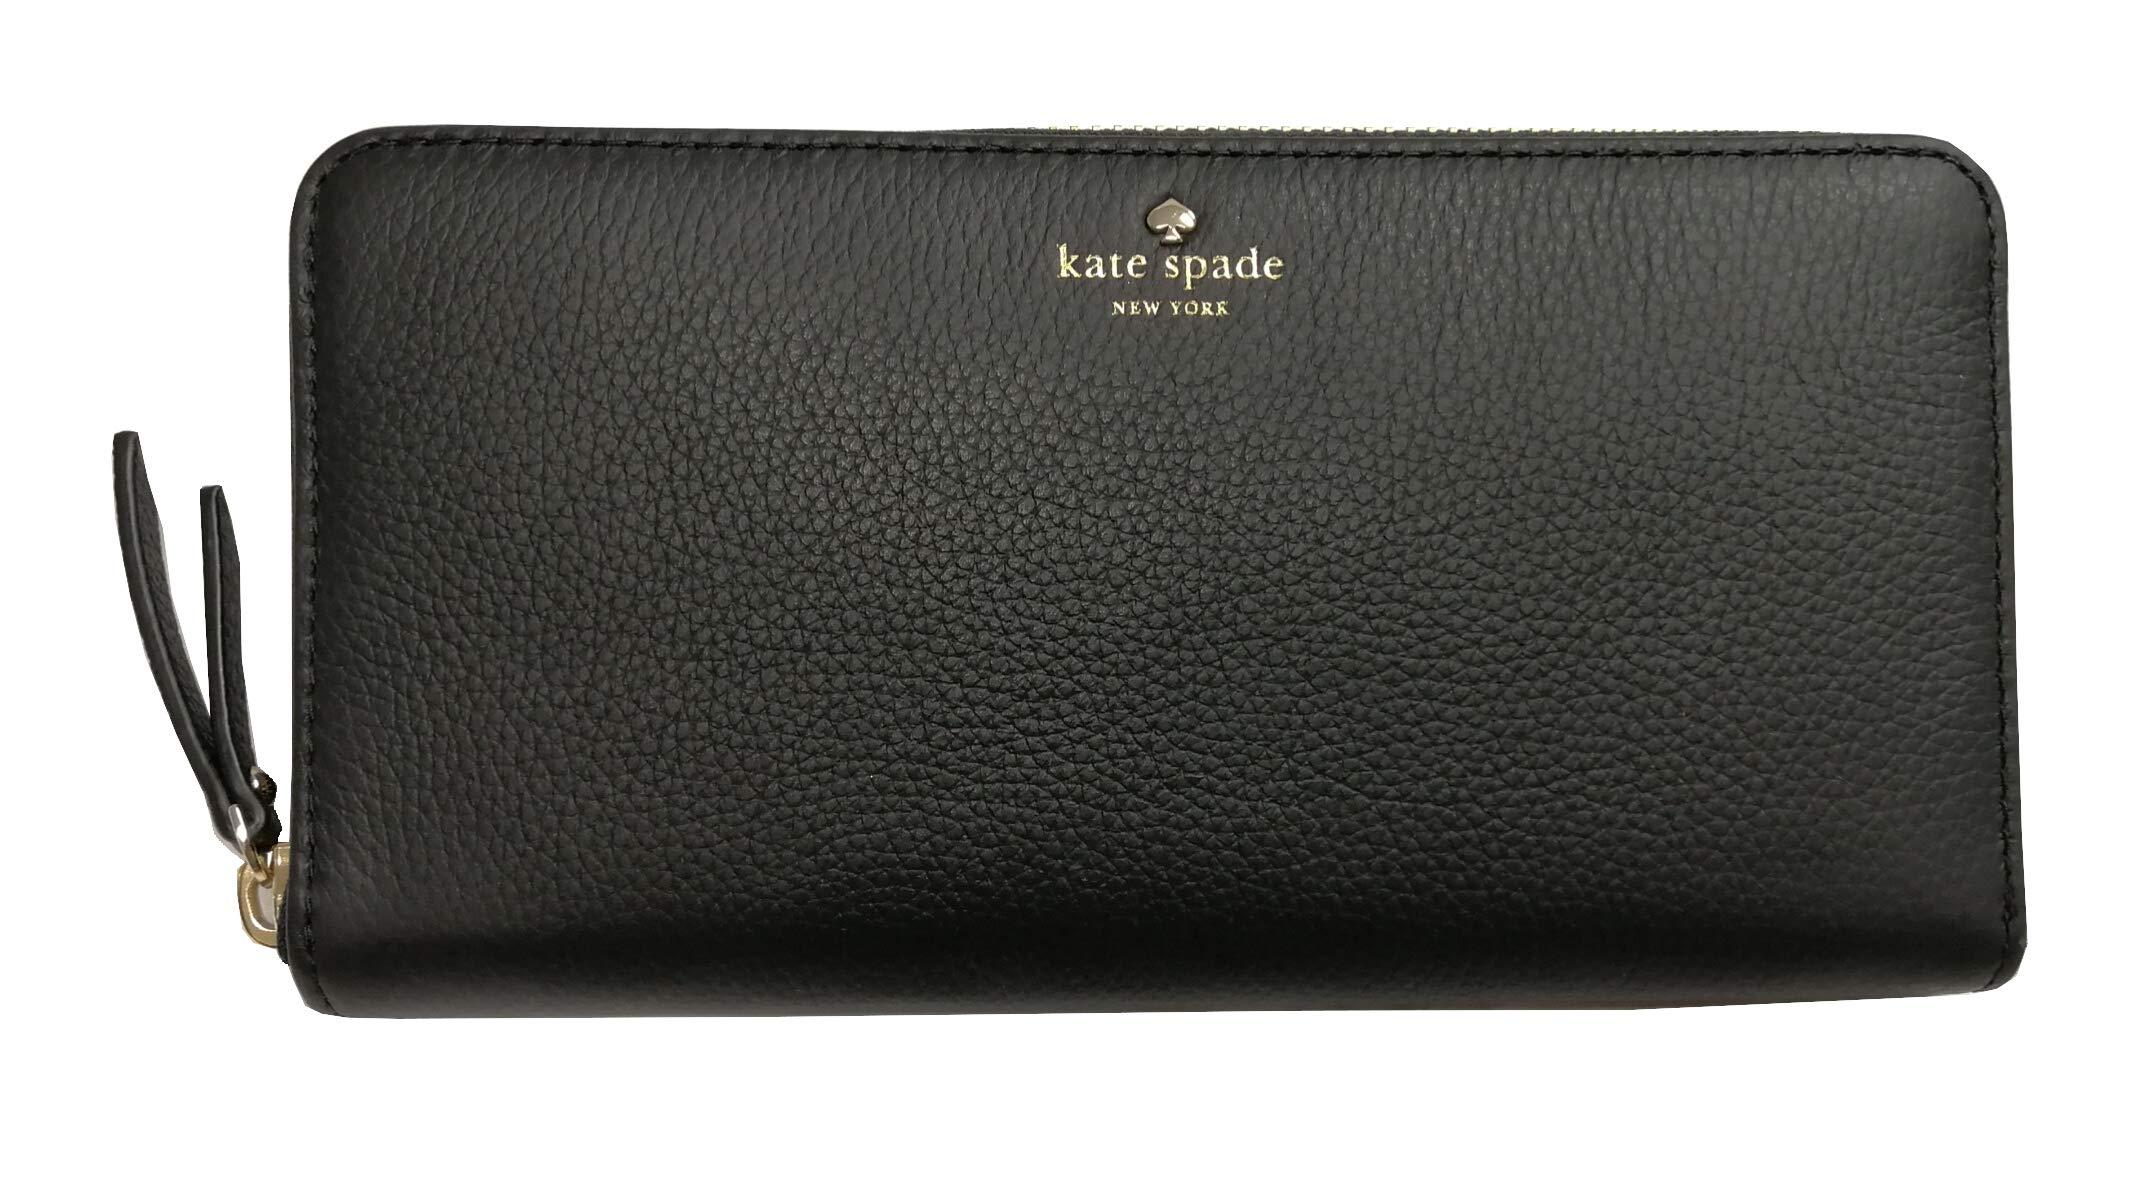 Kate Spade New York Neda Larcnmont Avenue Pebbled Leather Wallet Zip Around Black